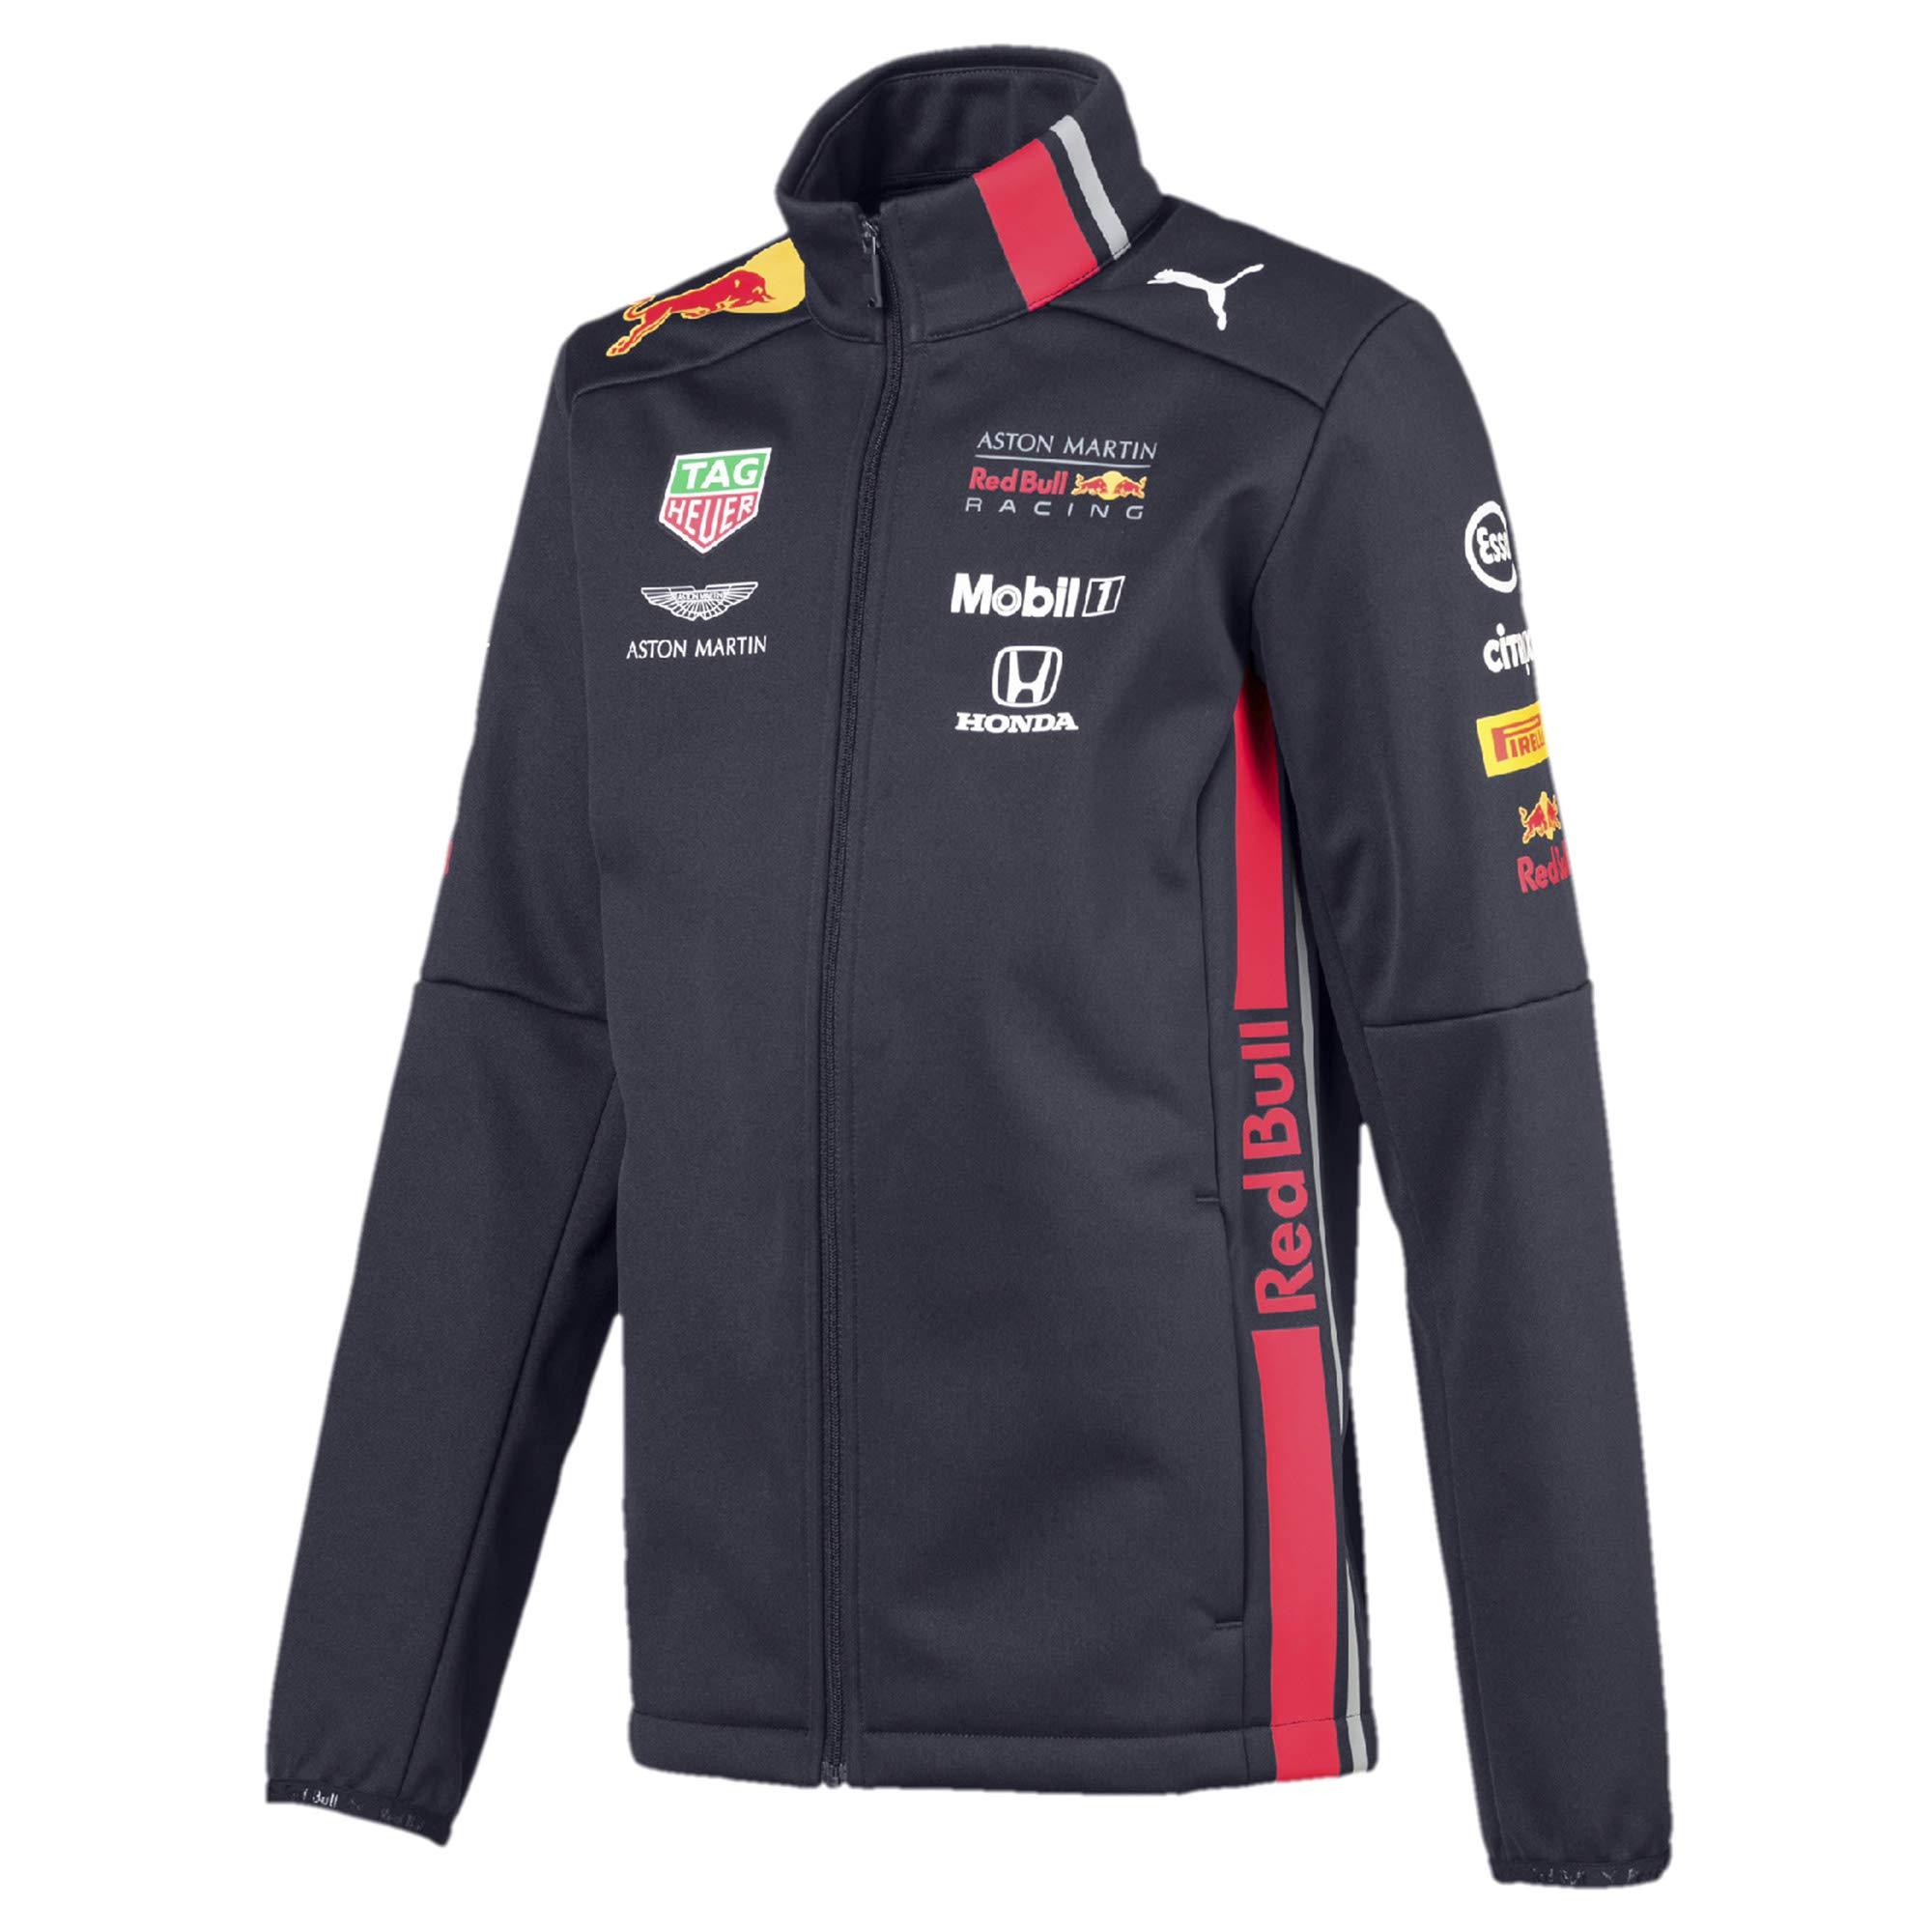 Red Bull Racing 2019 F1 Team Softshell Jacket (XXL)